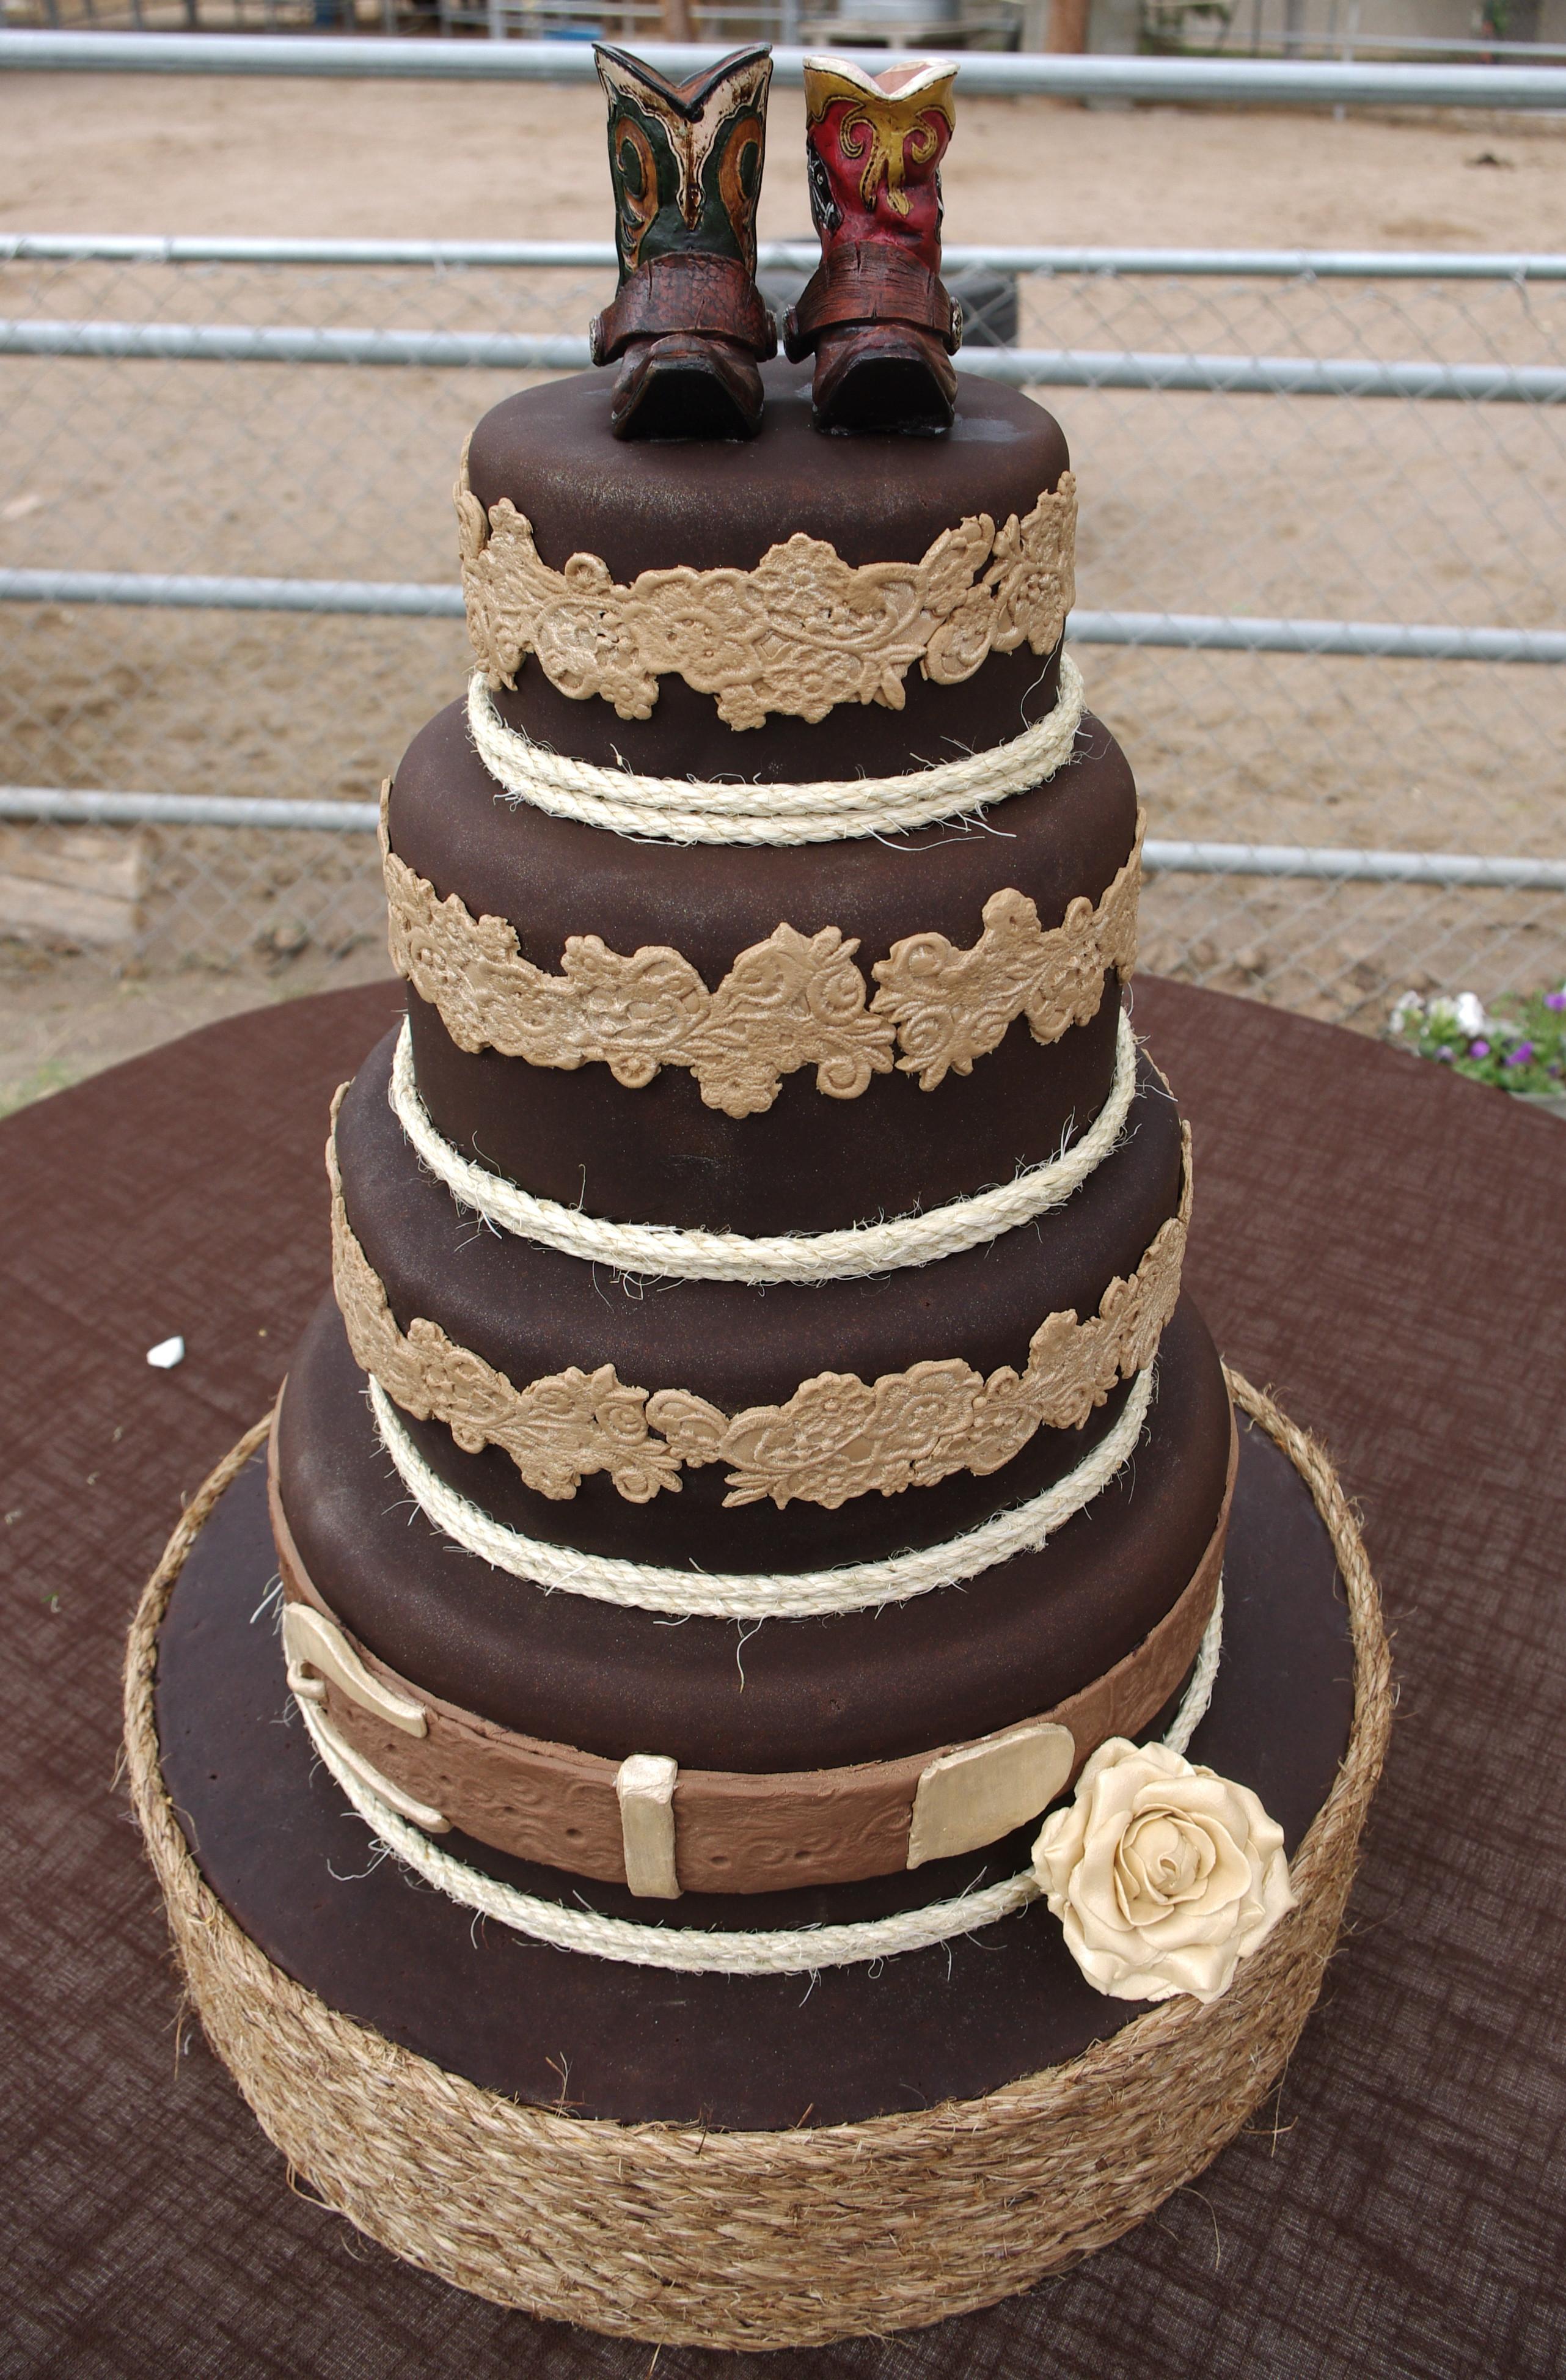 Western Wedding Cakes Ideas  Western Wedding Cakes Ideas